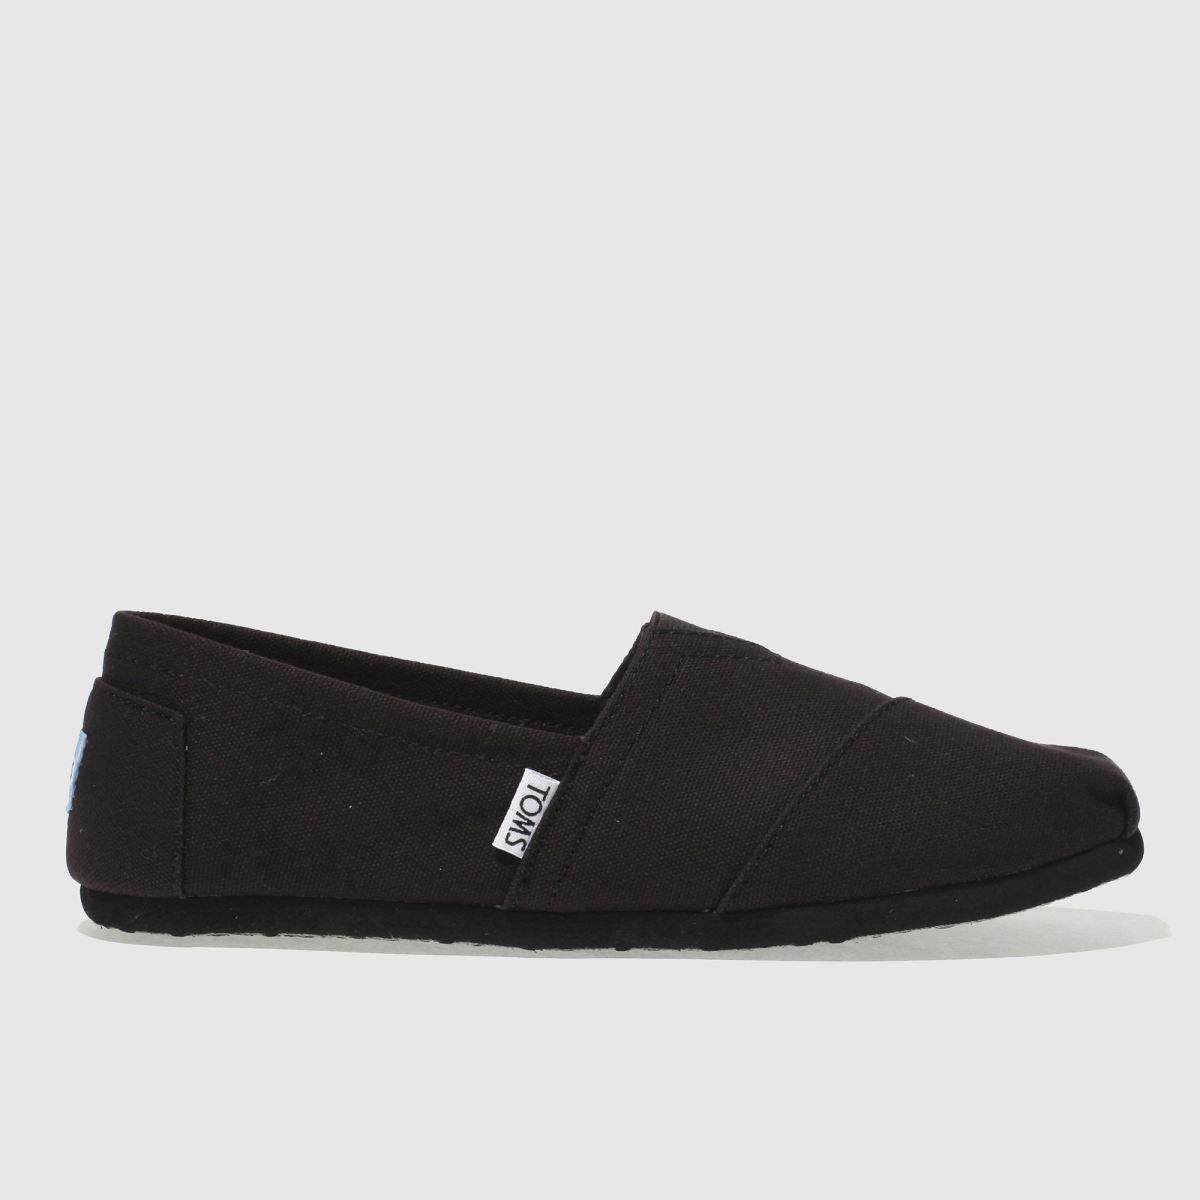 Toms Black Classic Ii Shoes